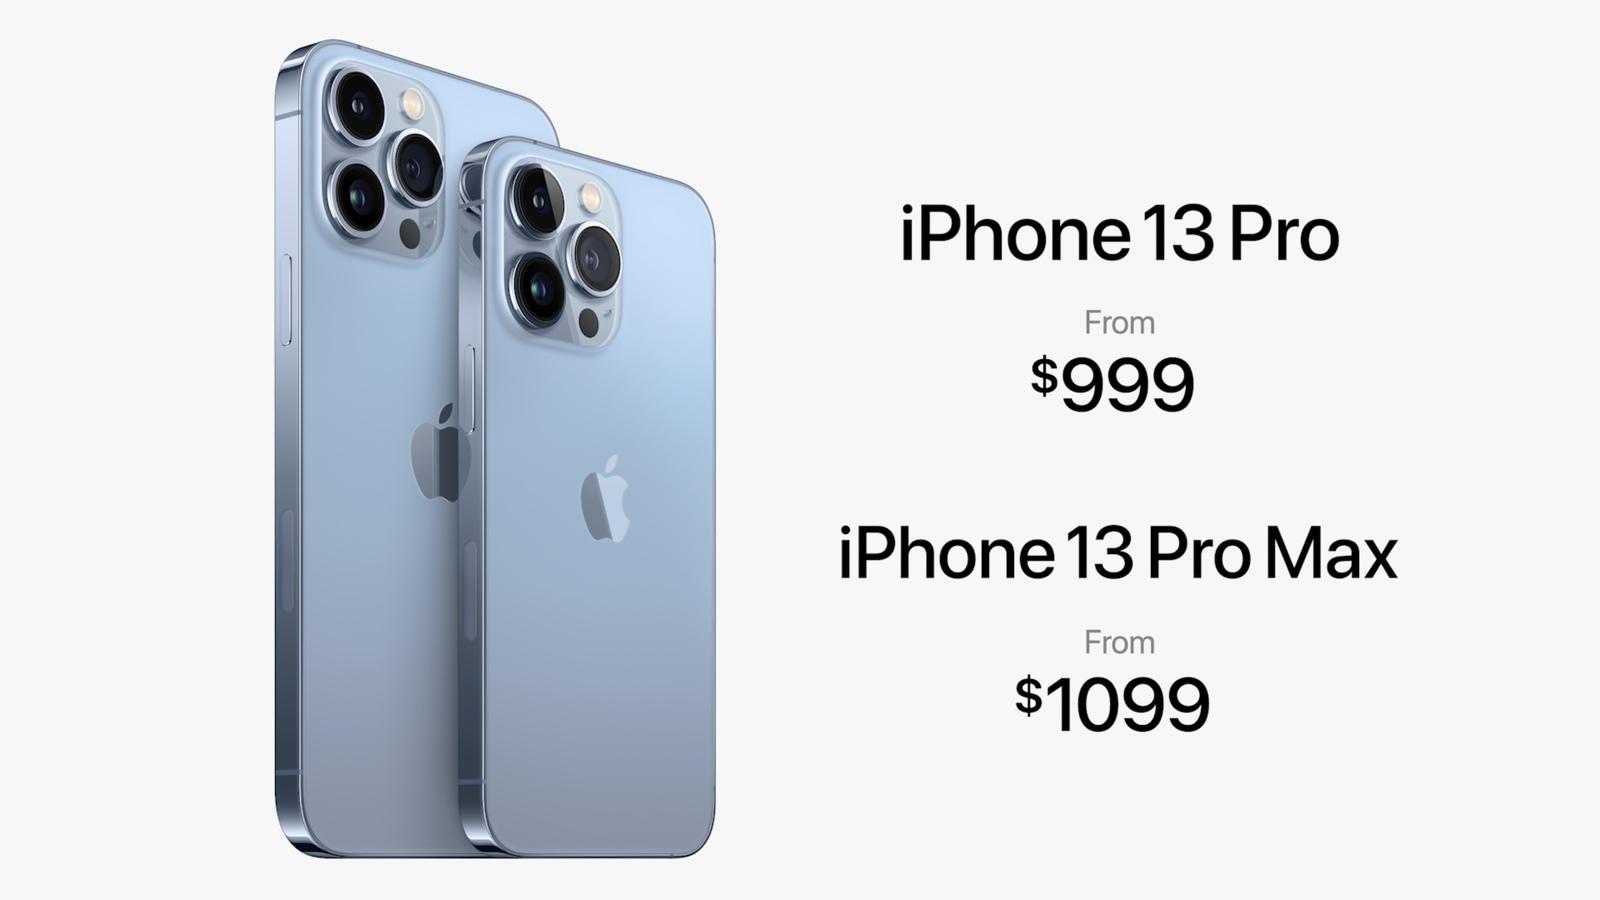 iphone 13 pro prezzo